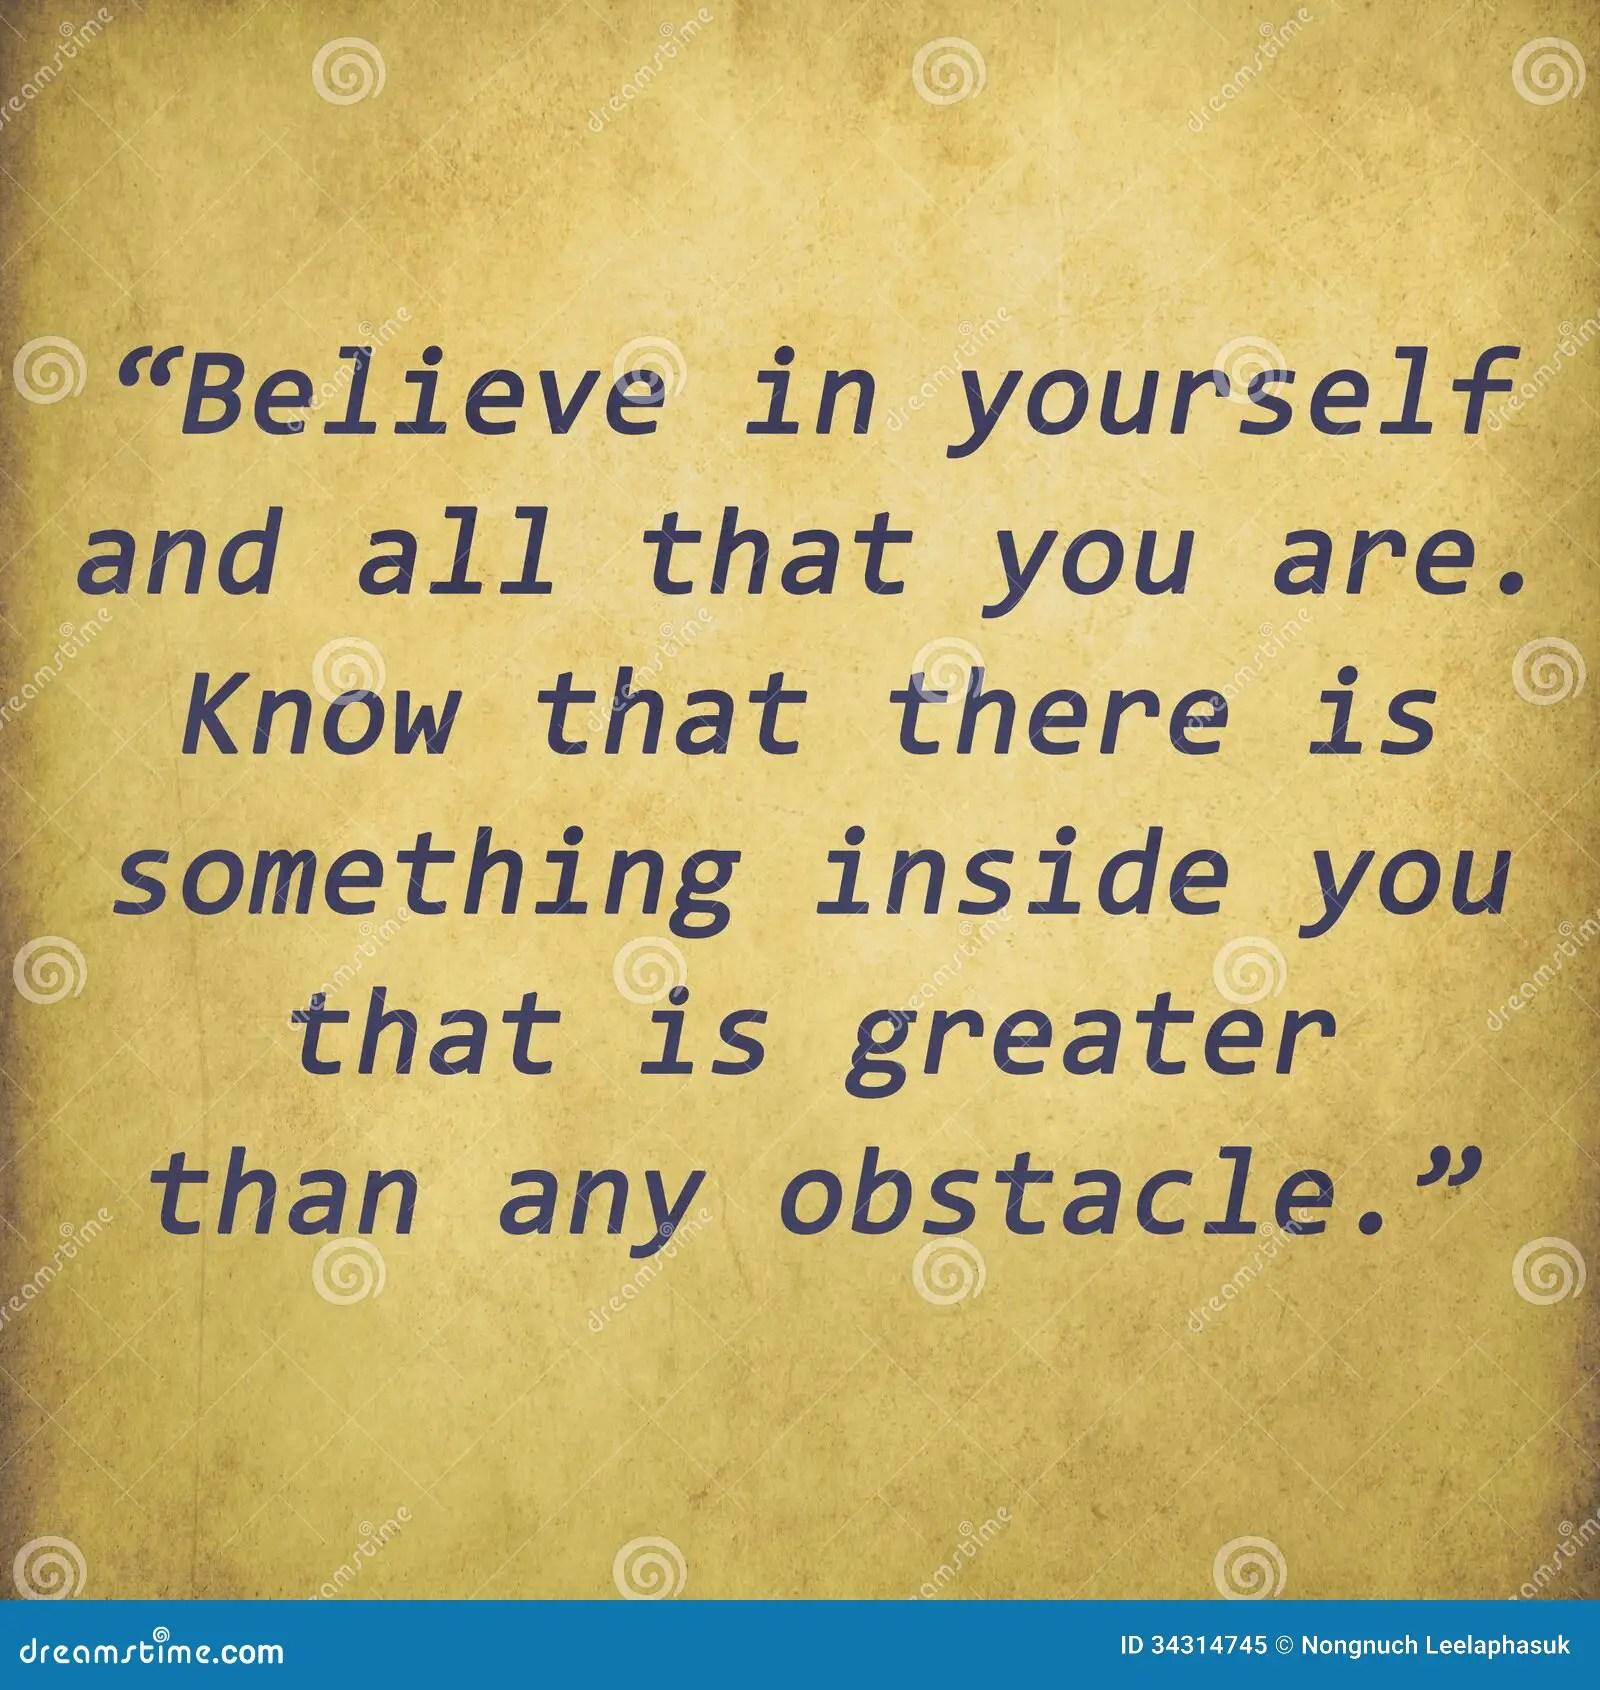 Encouraging Quotes Wallpaper Free Download Religious Clip Art Inspirational Quotes Quotesgram